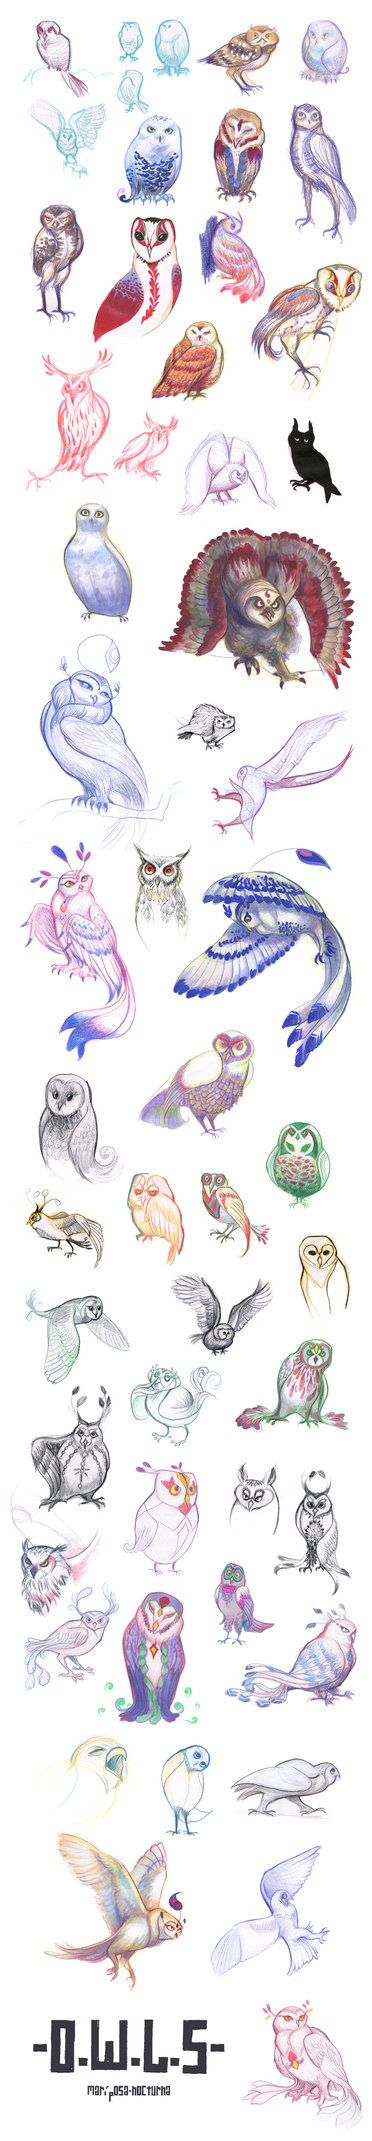 tumblr sketchdump : owl design by mariposa-nocturna on deviantART ★★★ Find More inspiration @creativeelc ★★★